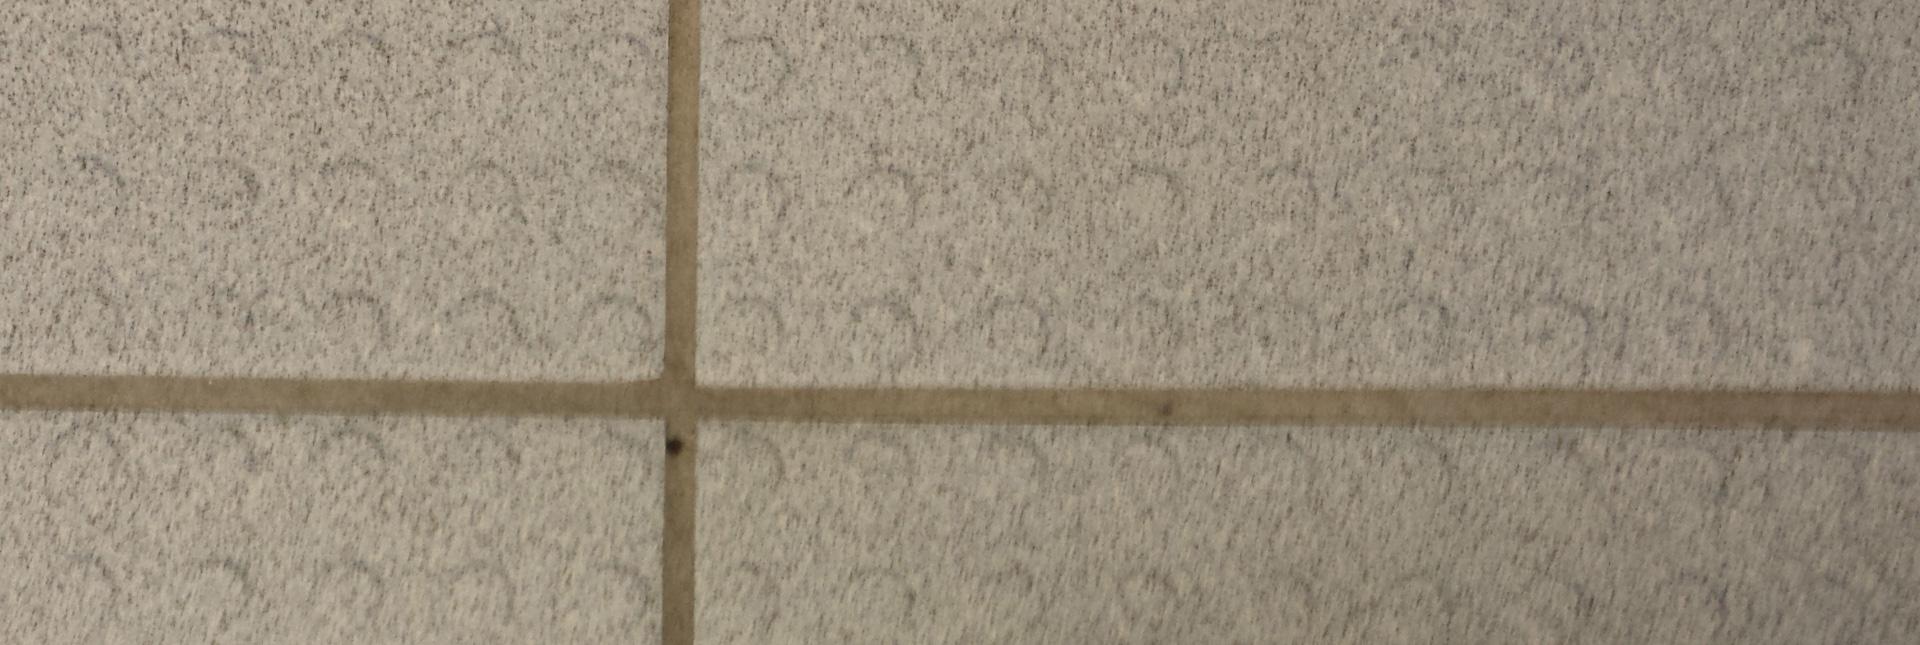 commercial-tile-grout-4